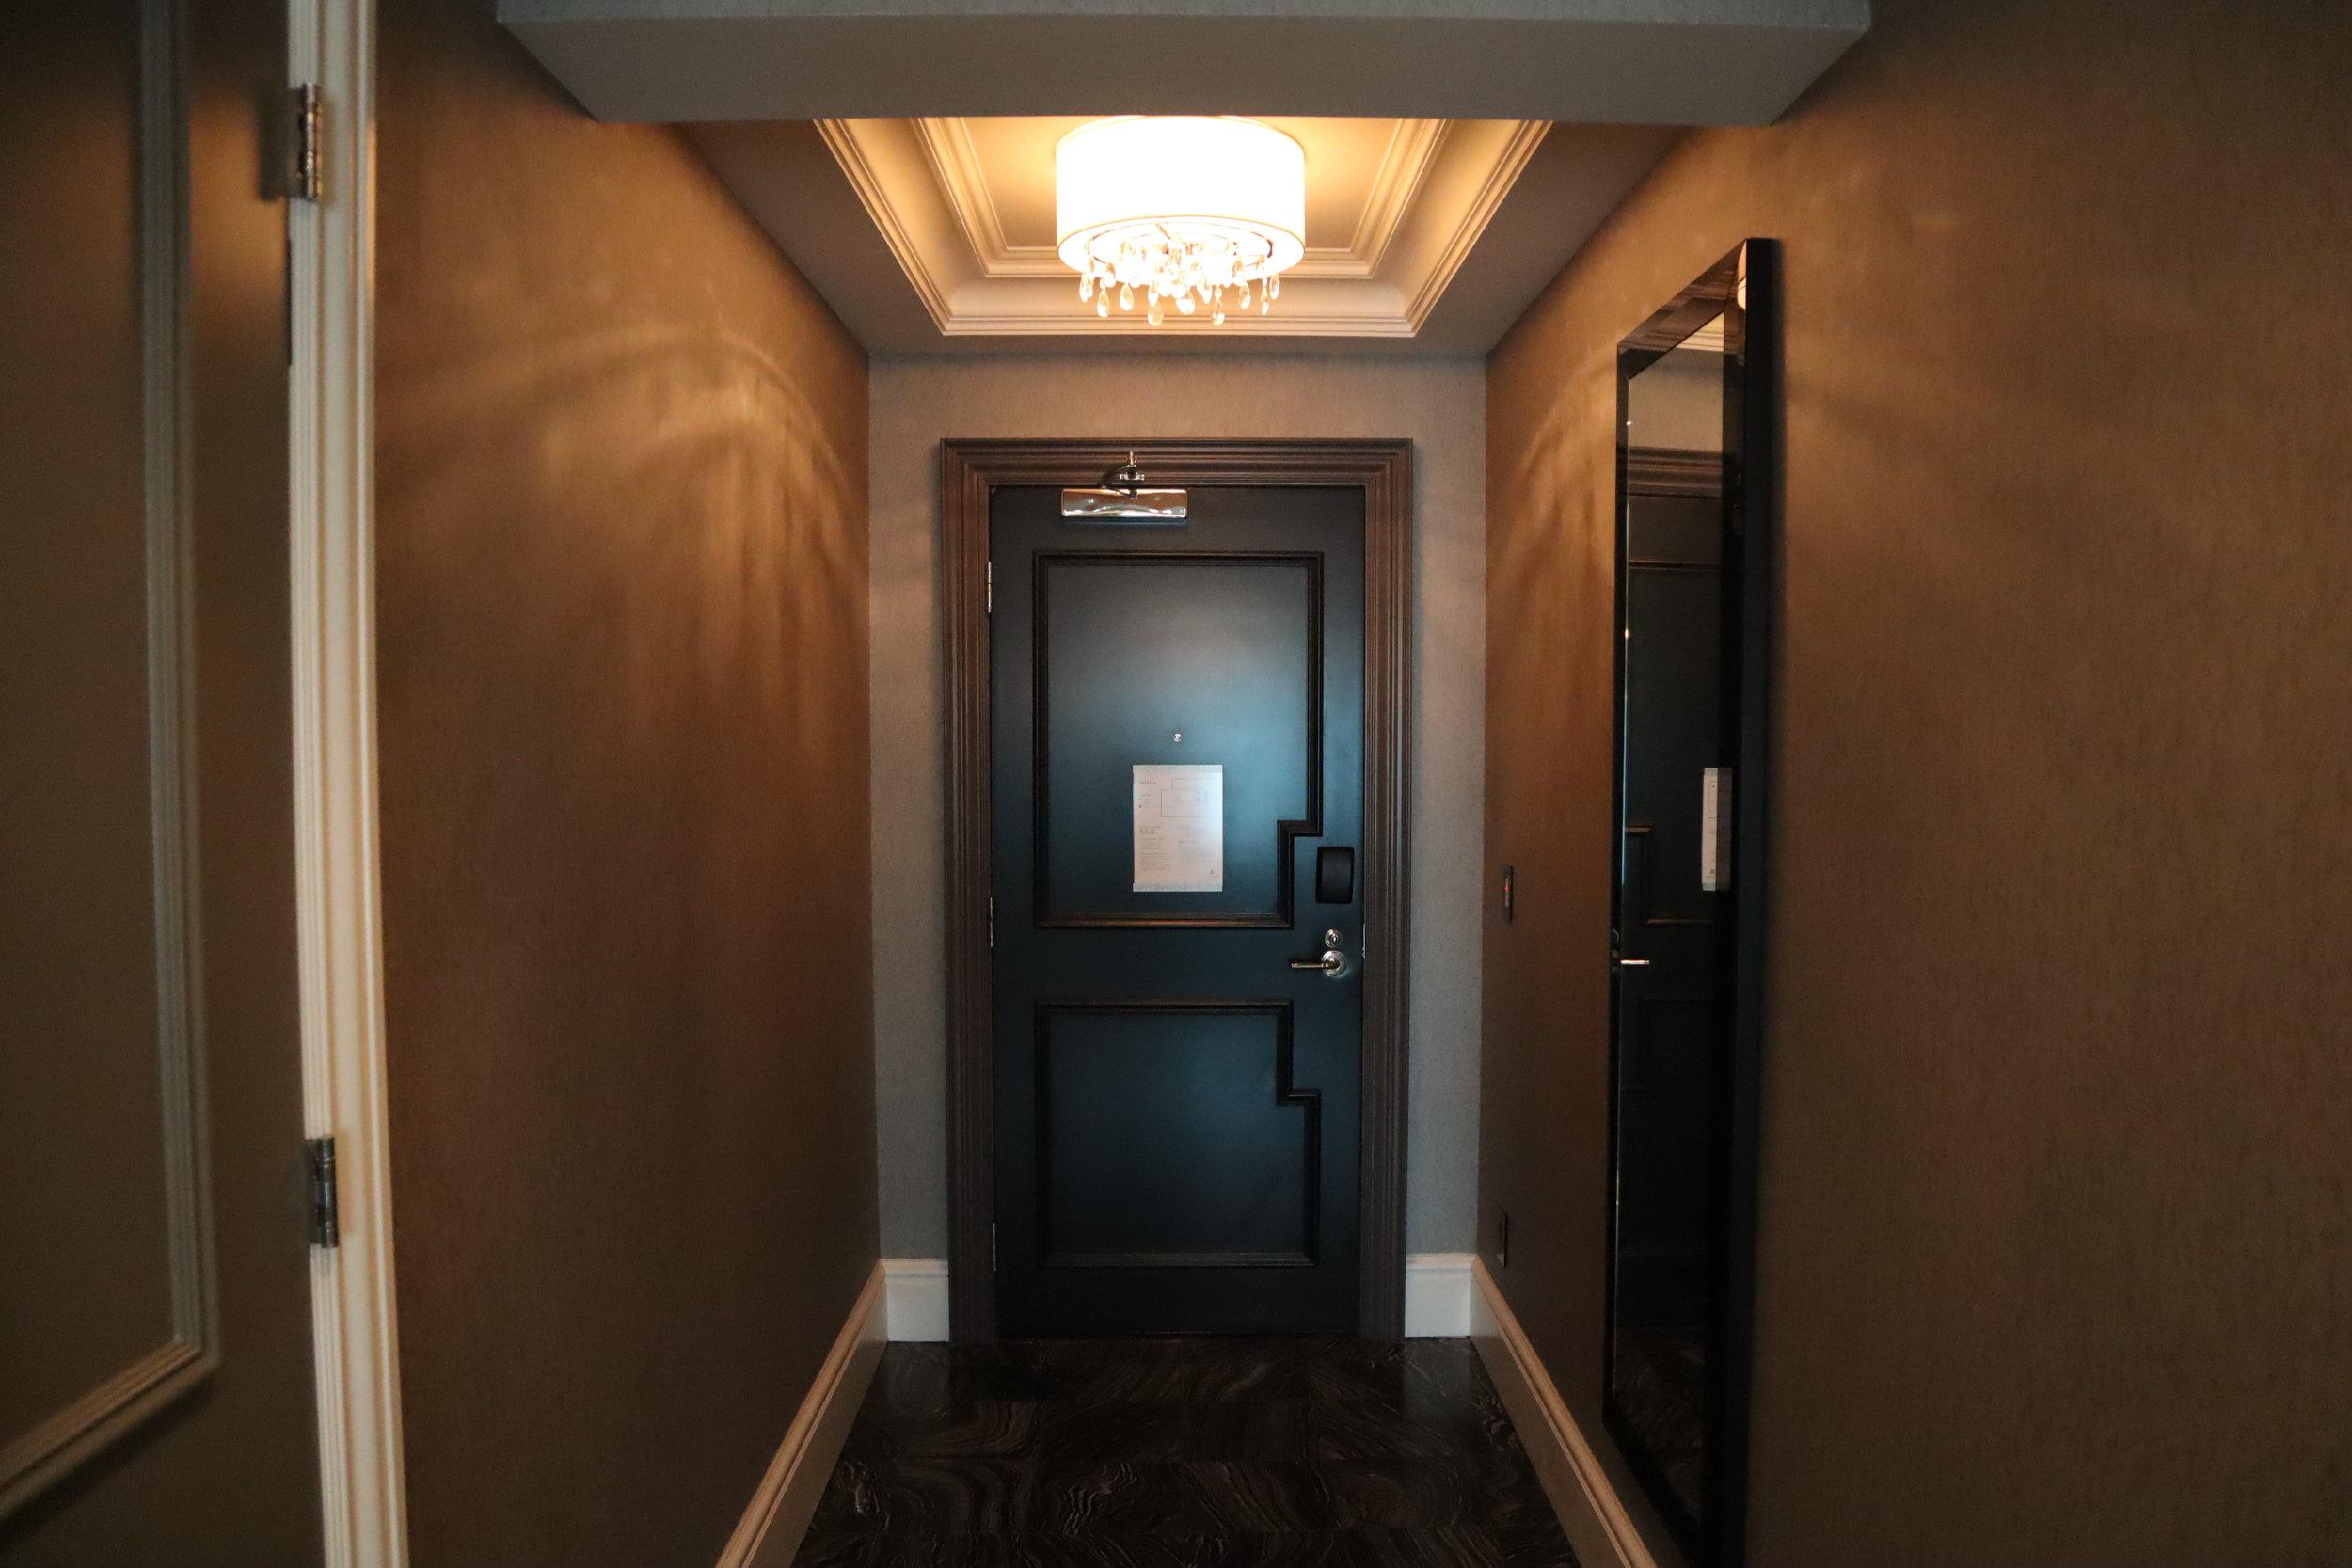 St. Regis Toronto – Two-bedroom suite entryway